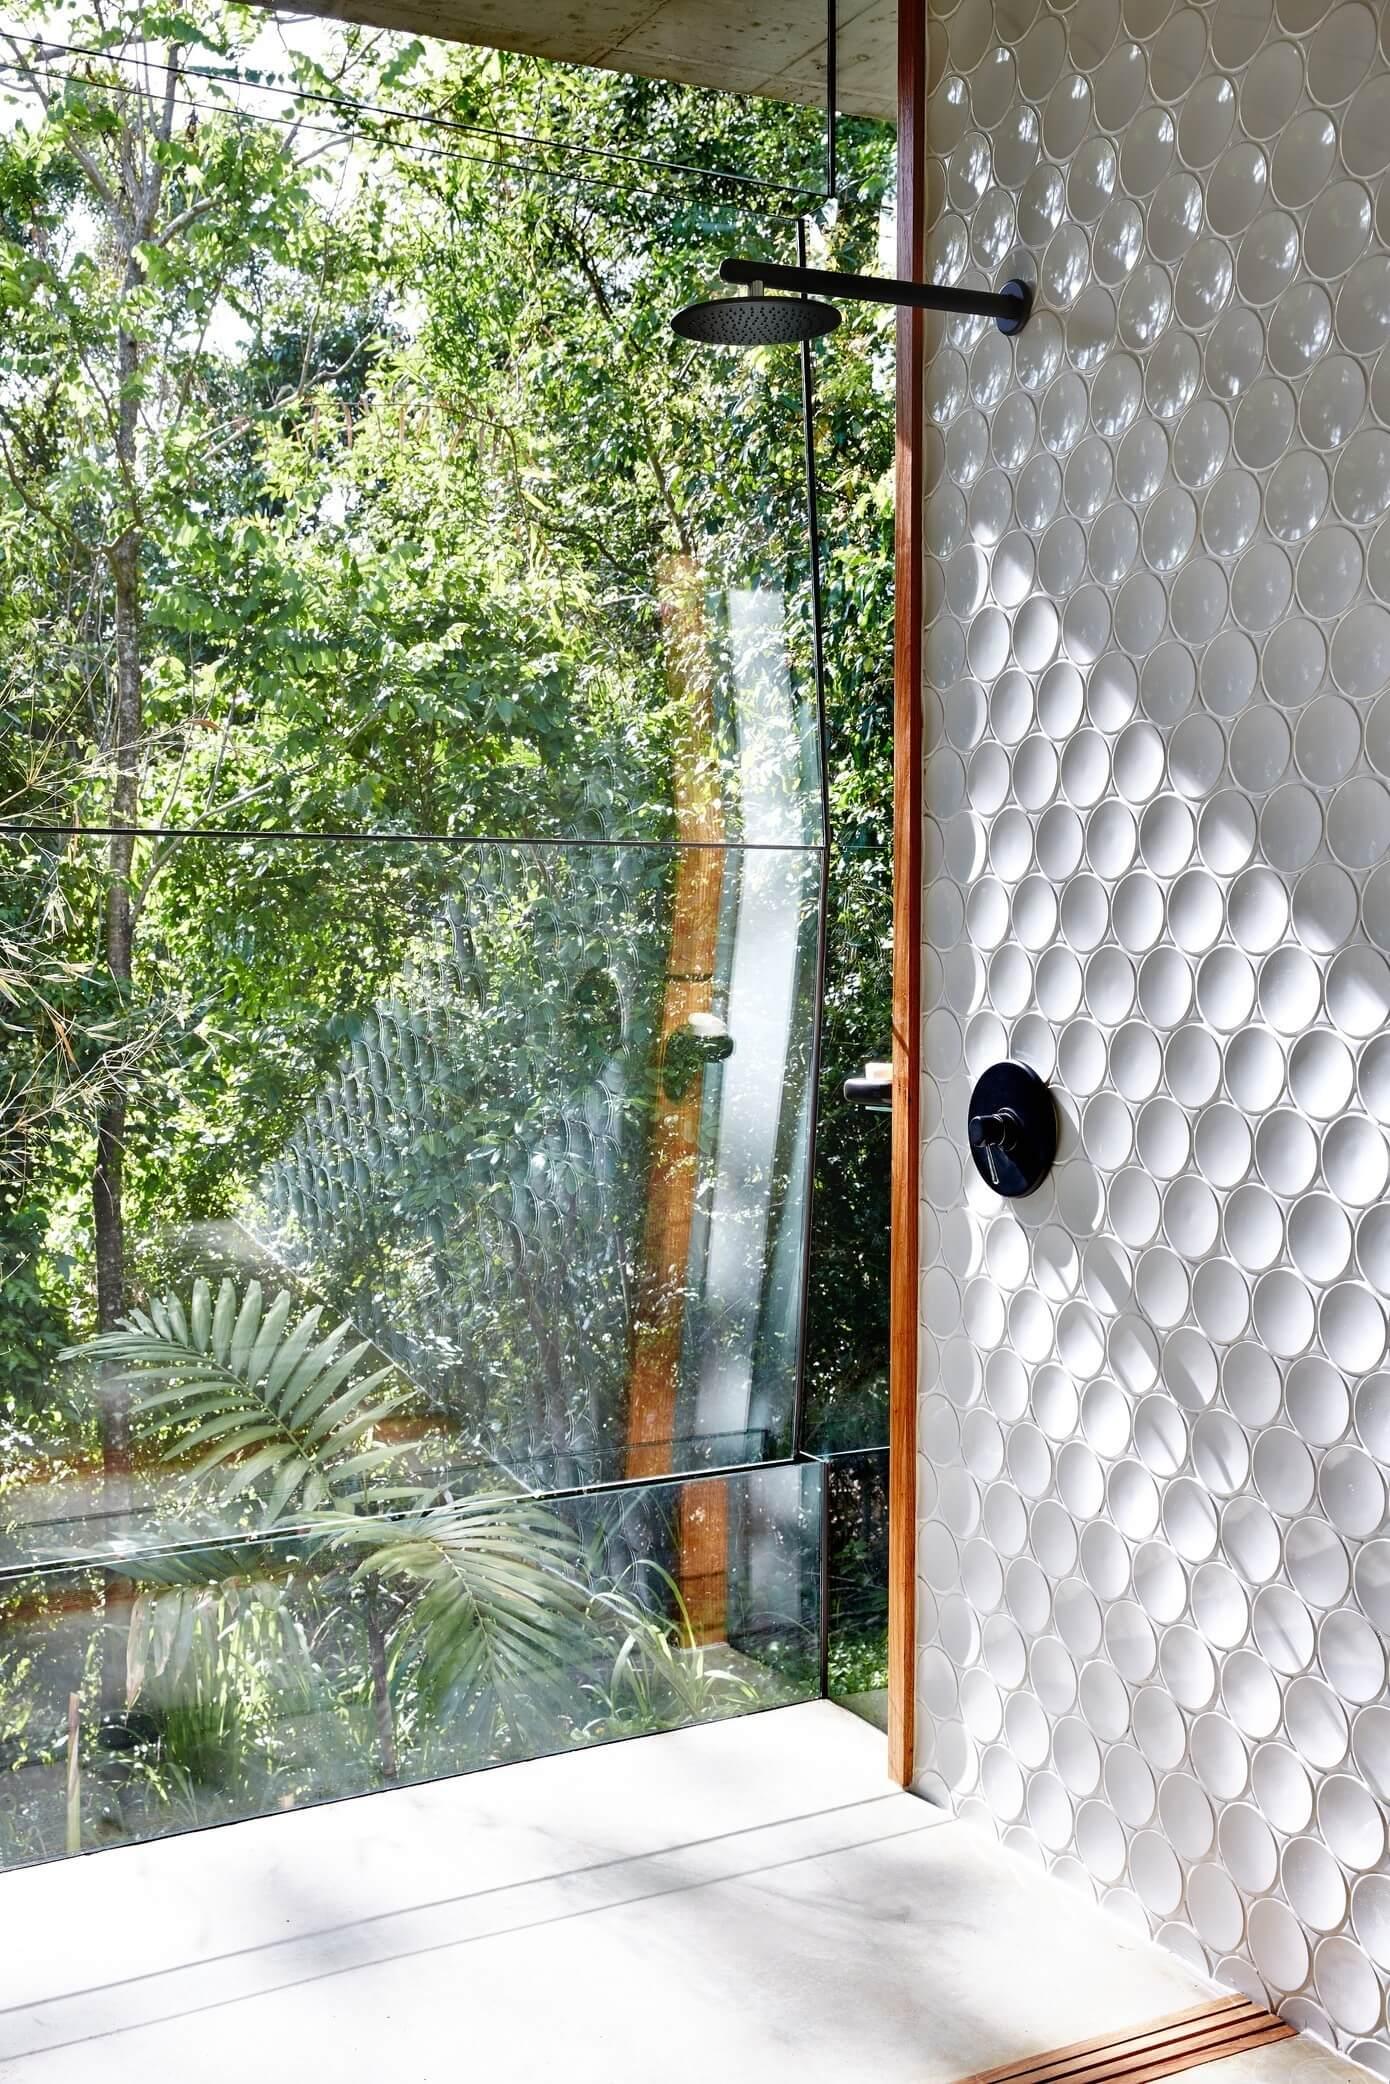 planchonella-house-jesse-bennett-architect-19